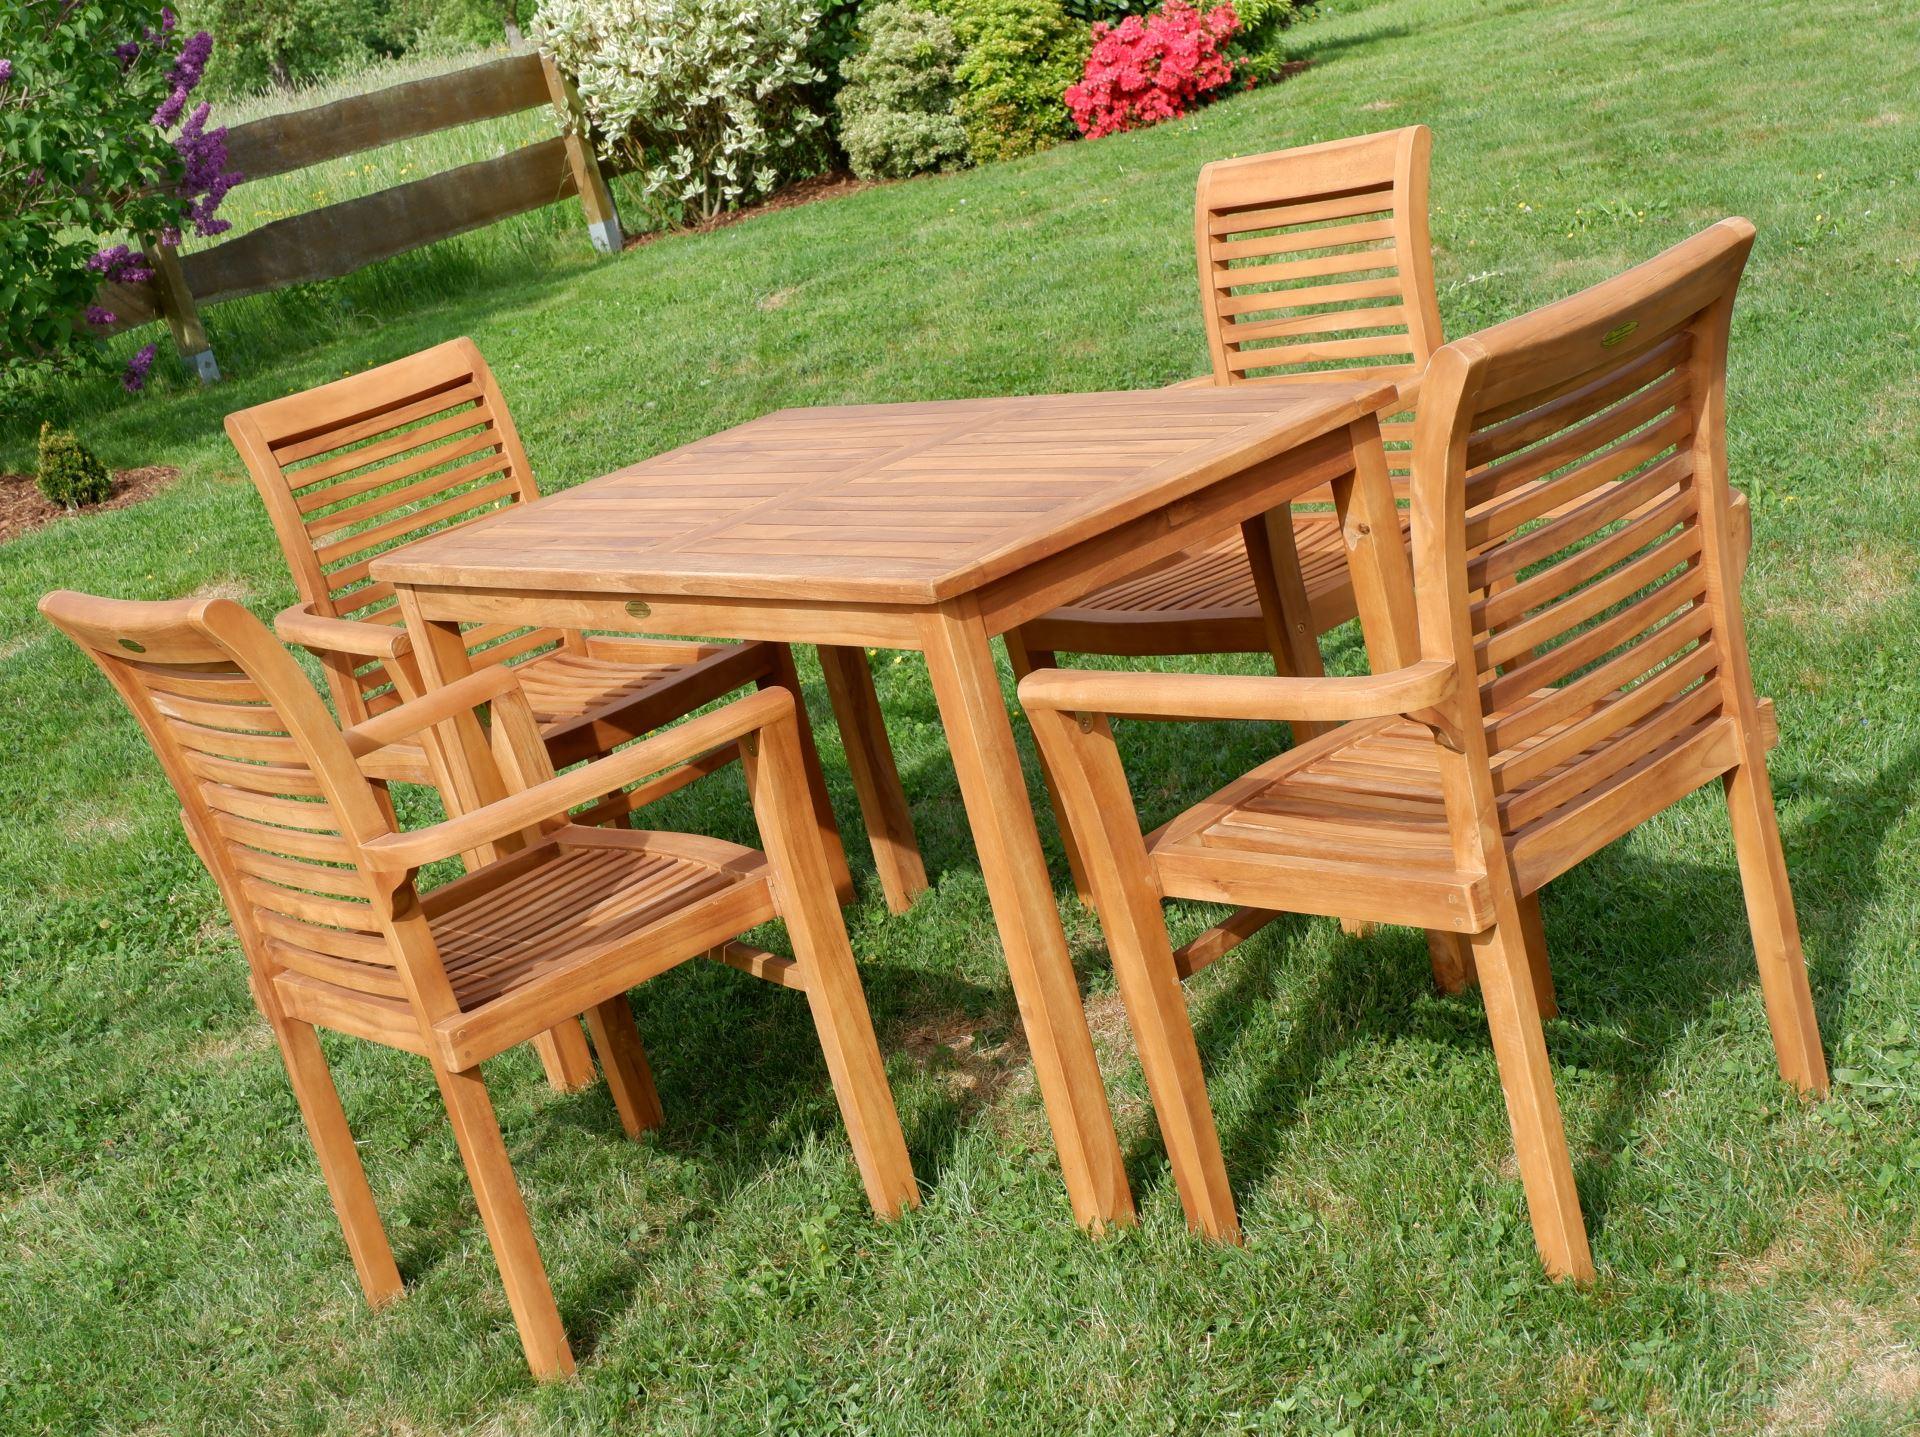 Teak Set Gartengarnitur Gartentisch 120x70 Cm 4 Sessel Holz Jav Alpen